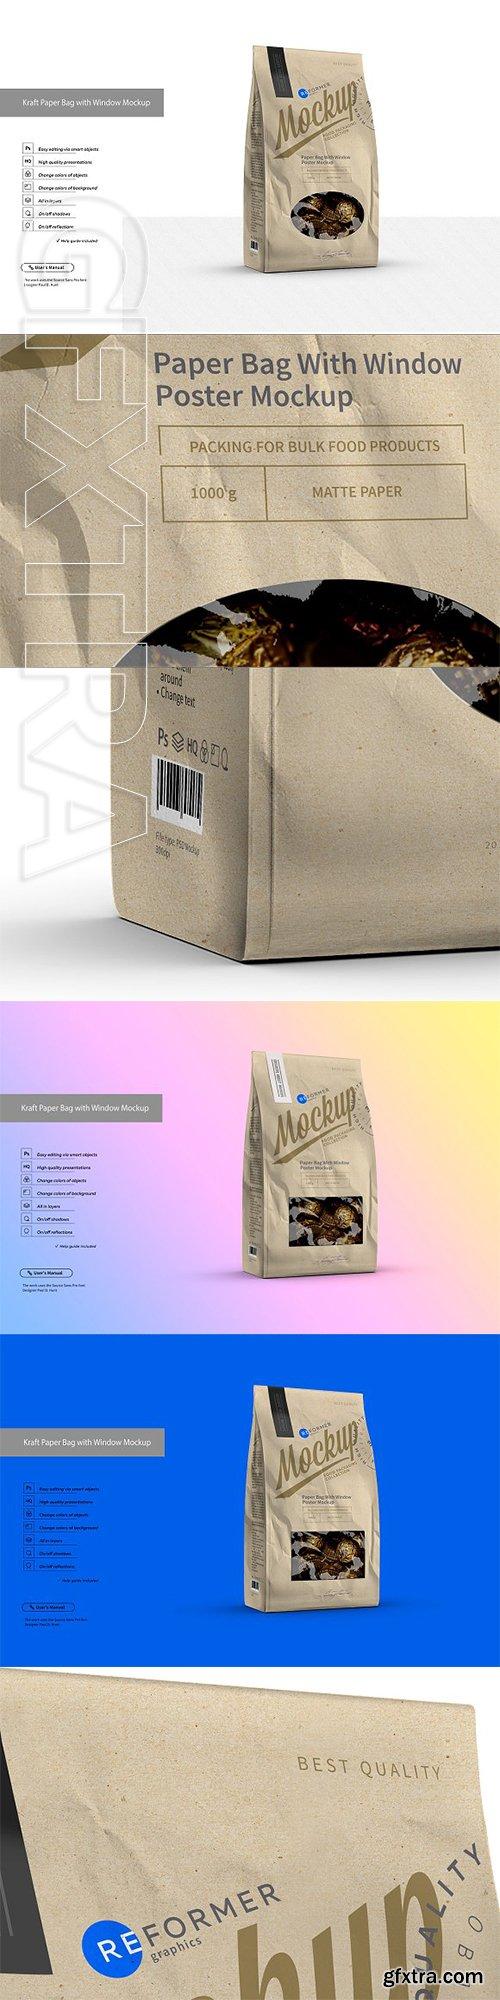 CreativeMarket - Kraft Paper Bag with Window Mockup 3158882